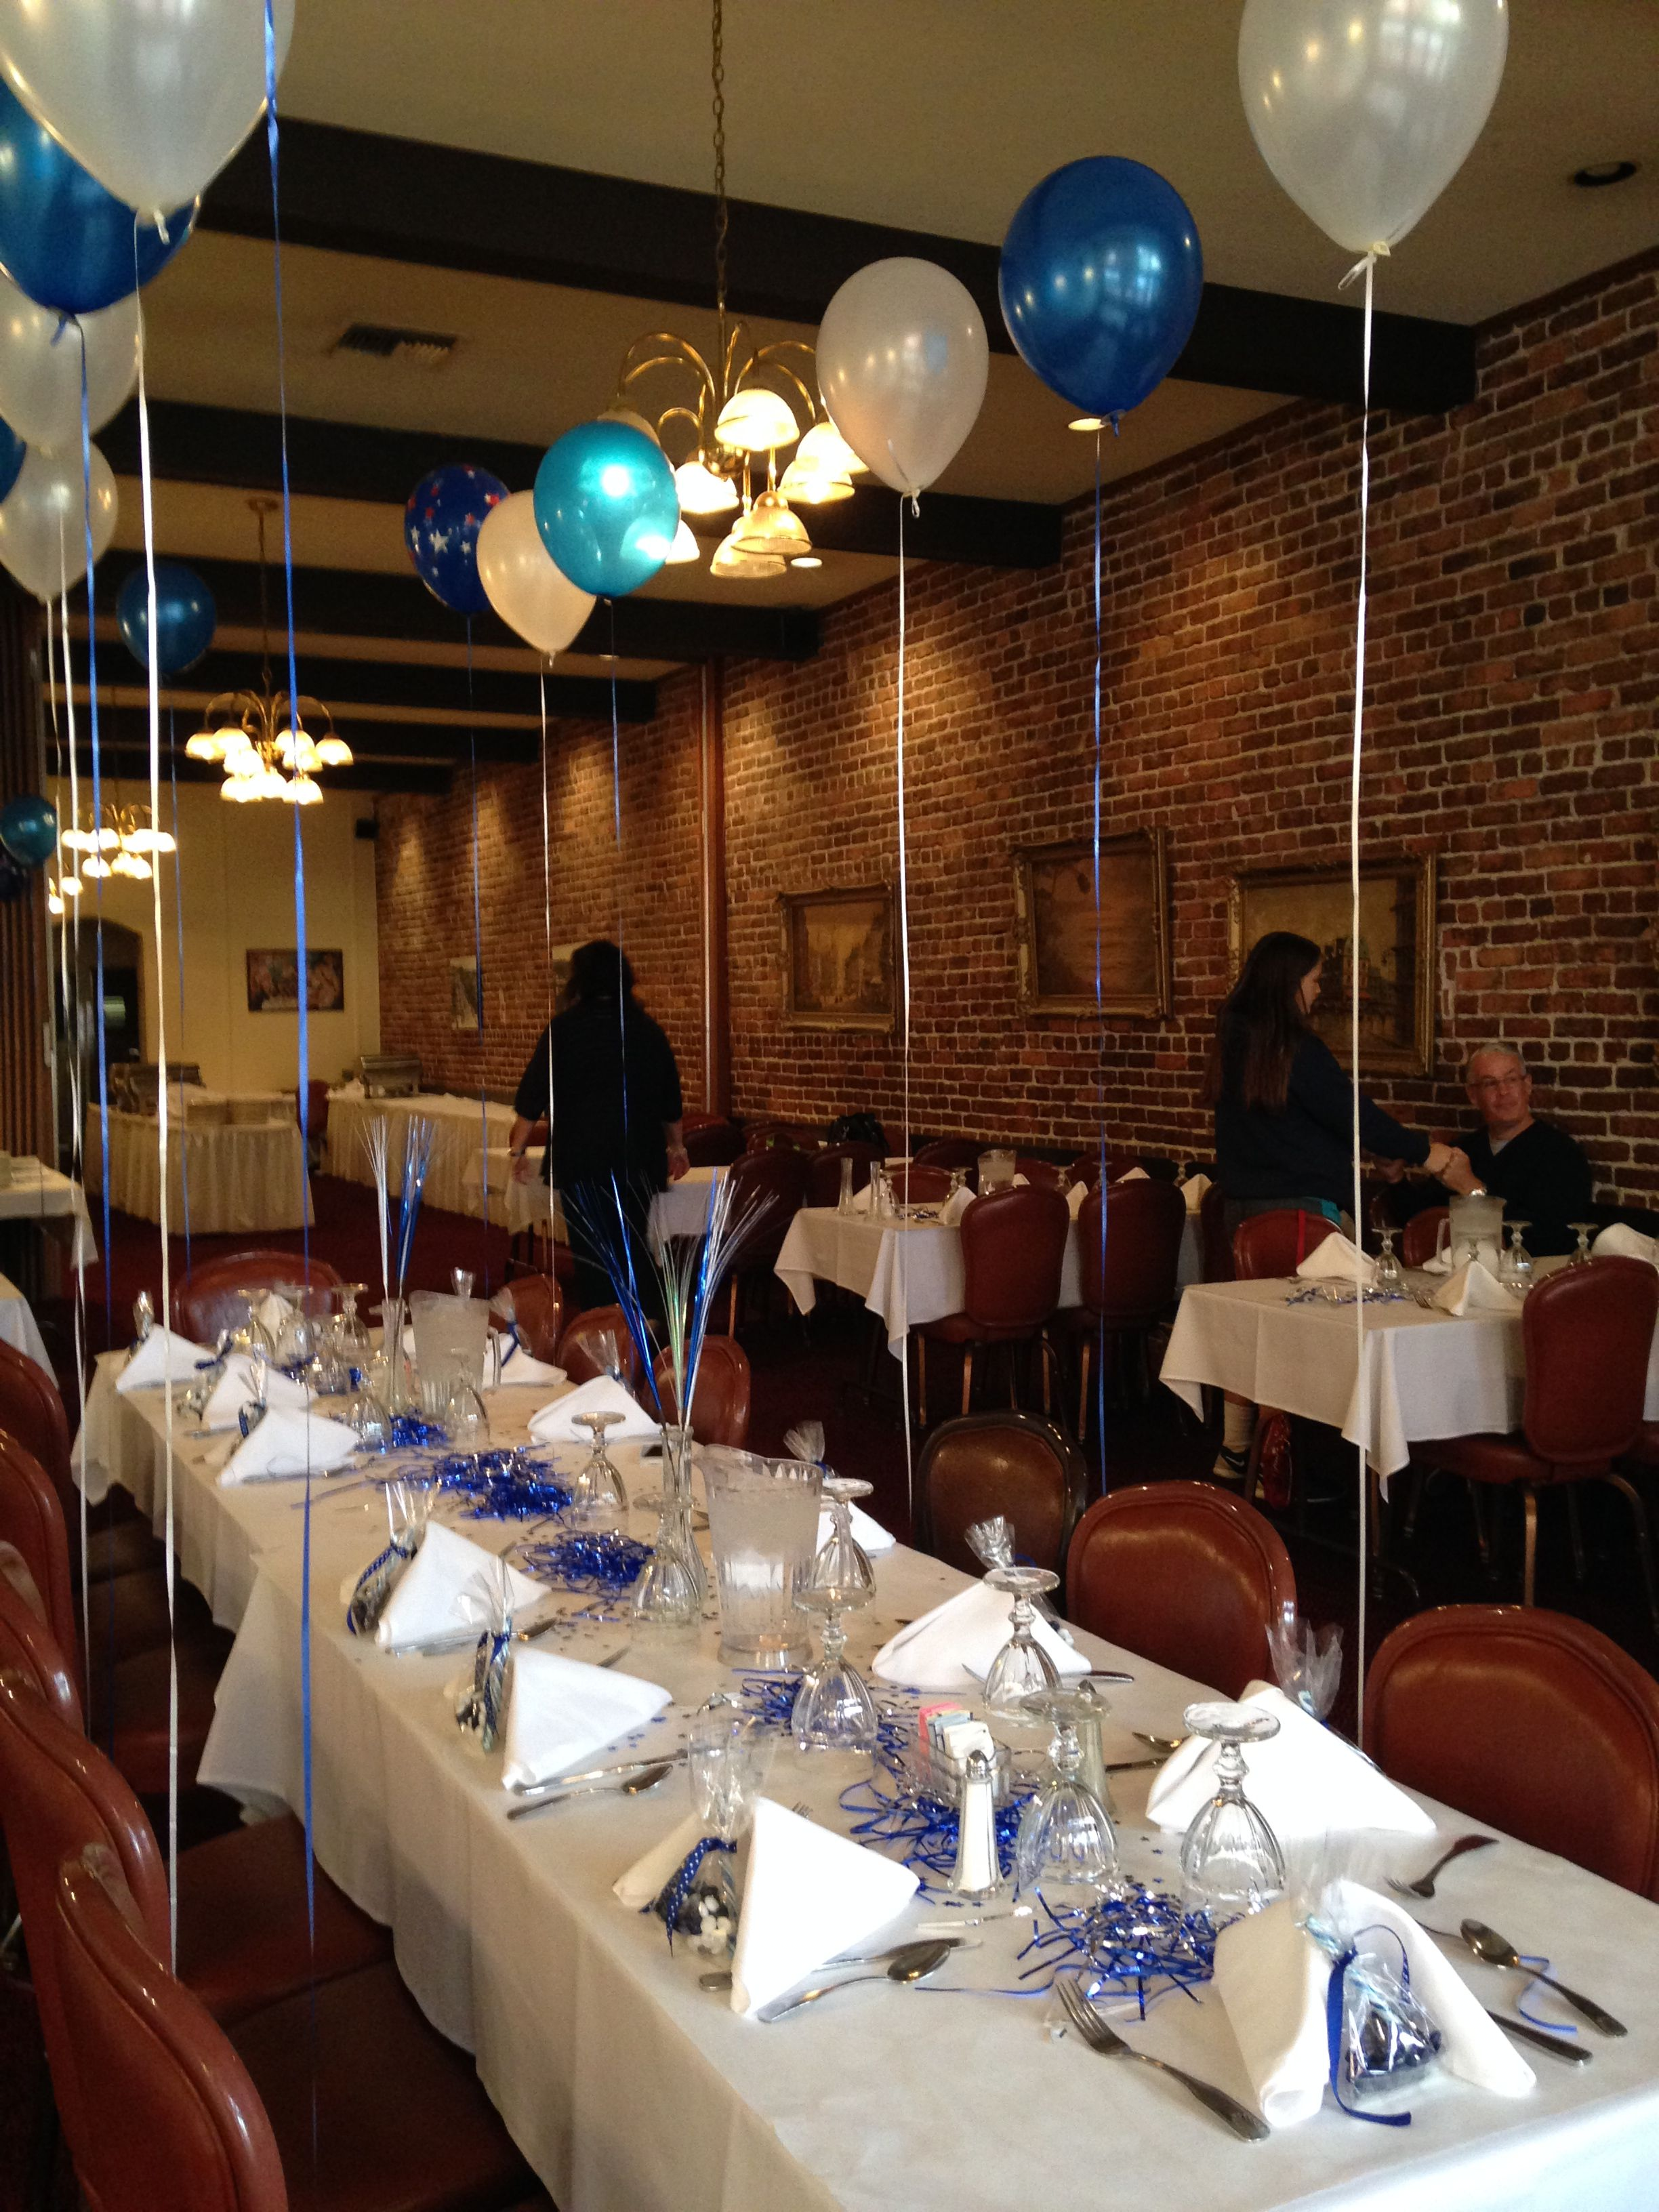 Volleyball Banquet Banquet Centerpieces Sports Banquet Decorations Sports Banquet Centerpieces